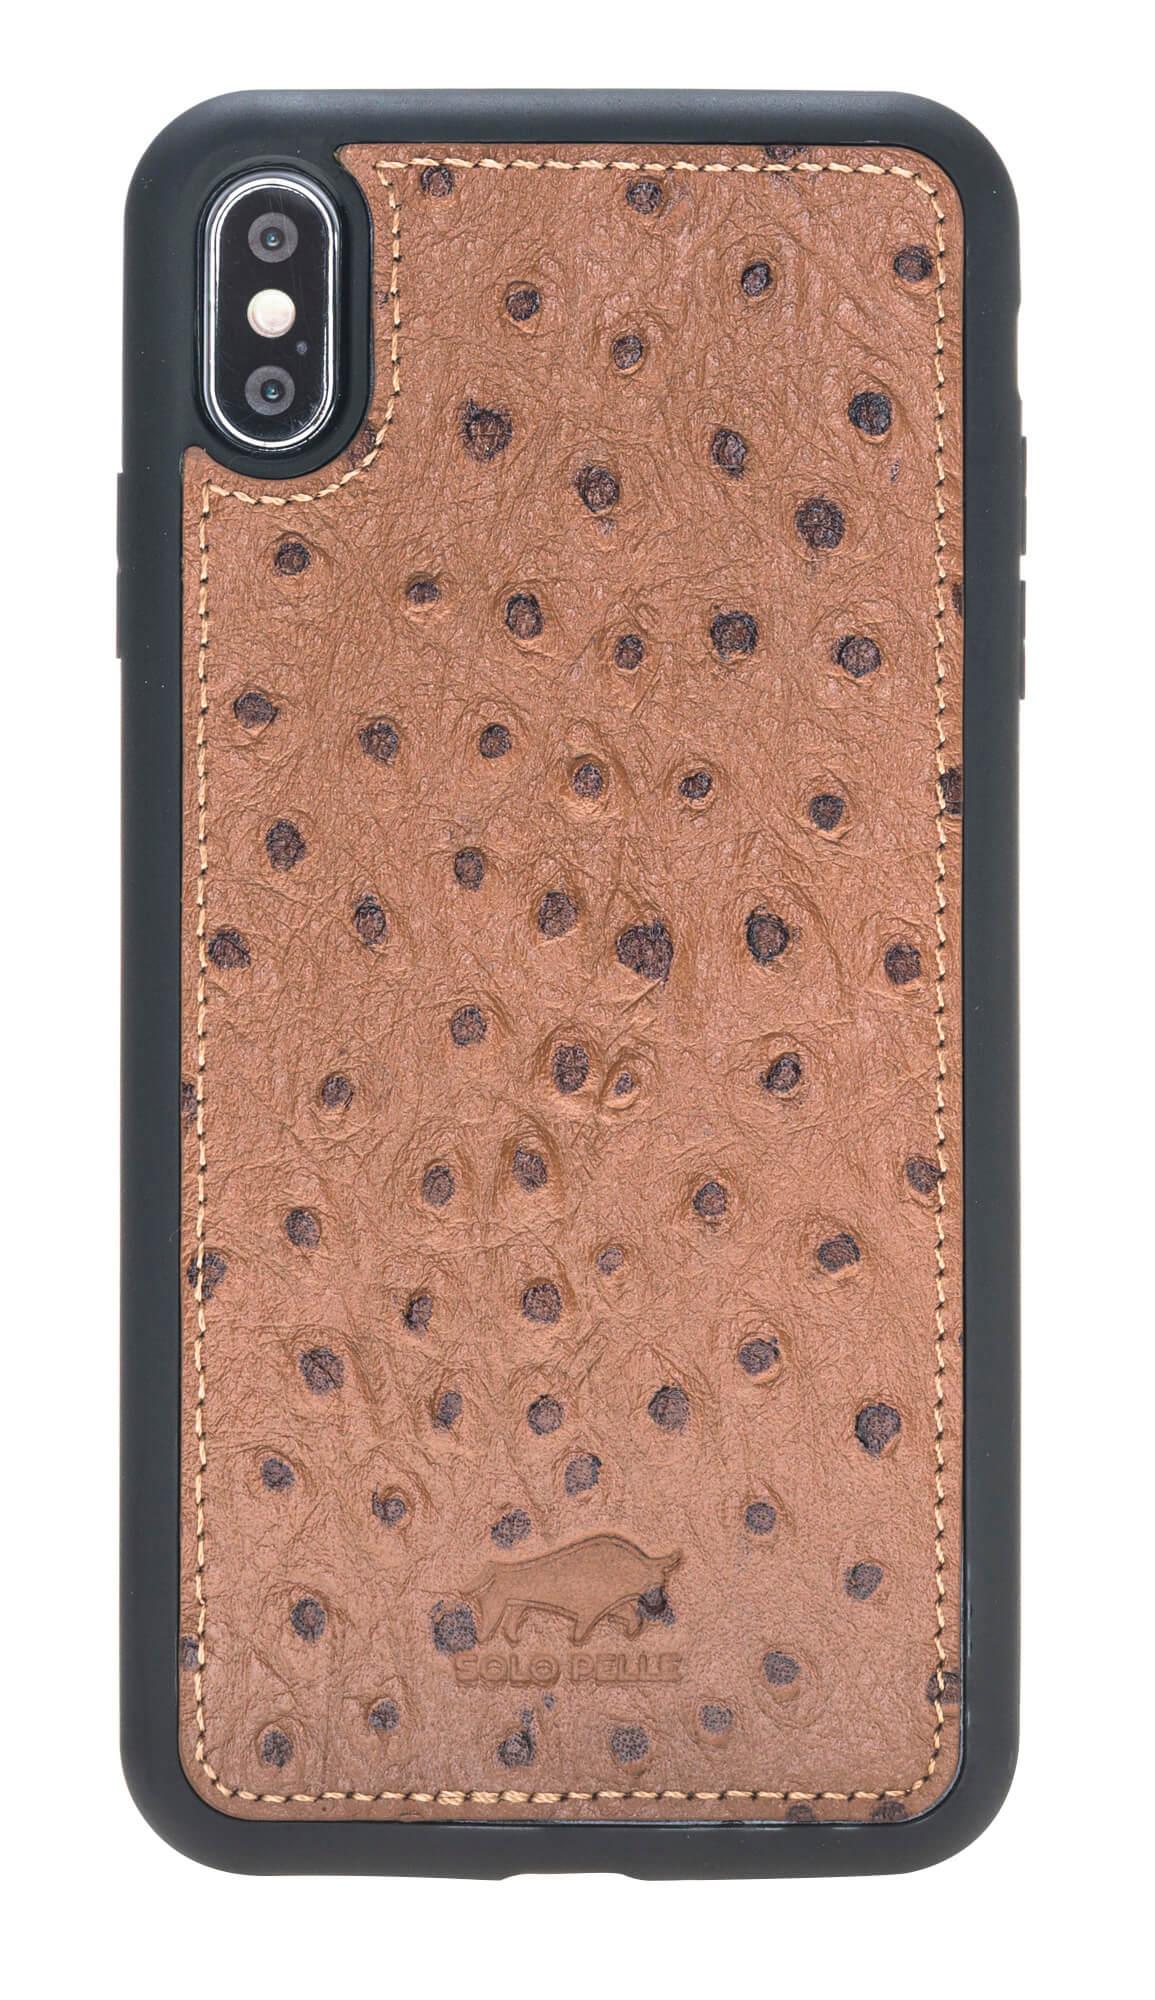 iPhone XS Max Abnehmbare Lederhülle (2in1) in Straussprägung Braun